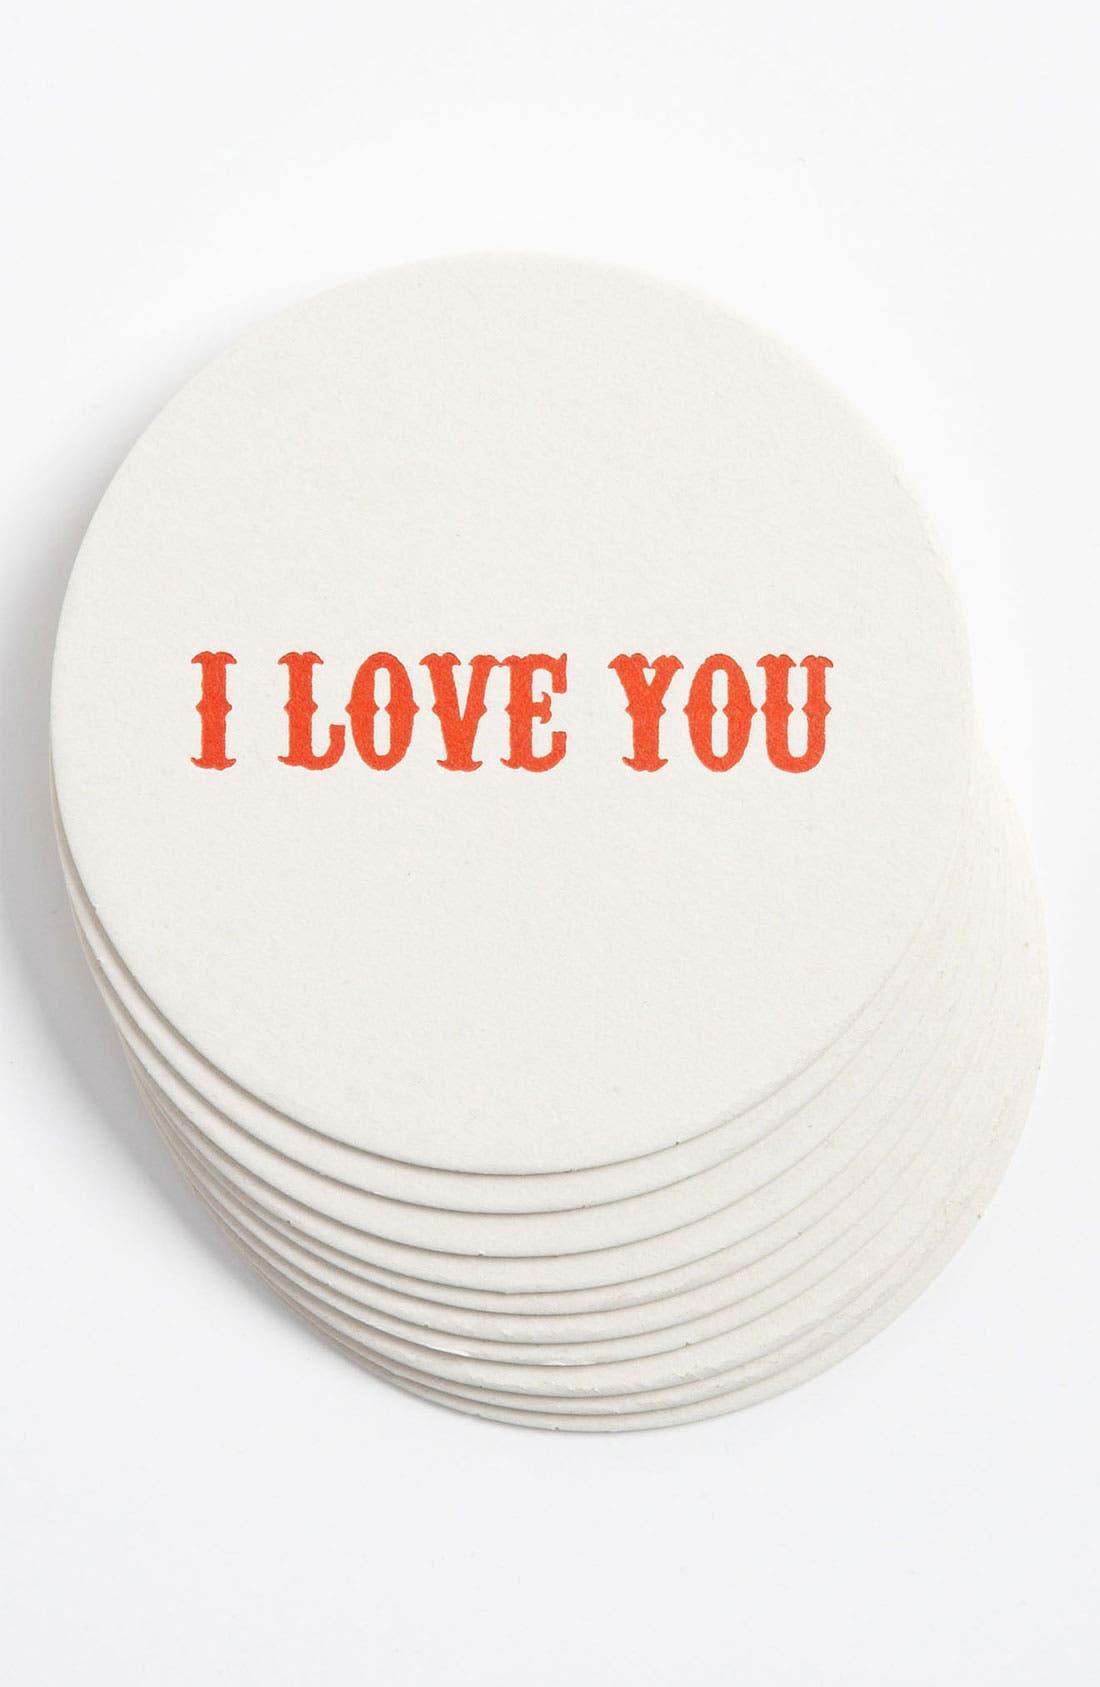 Alternate Image 1 Selected - 'I Love You' Letterpress Coasters (Set of 10)